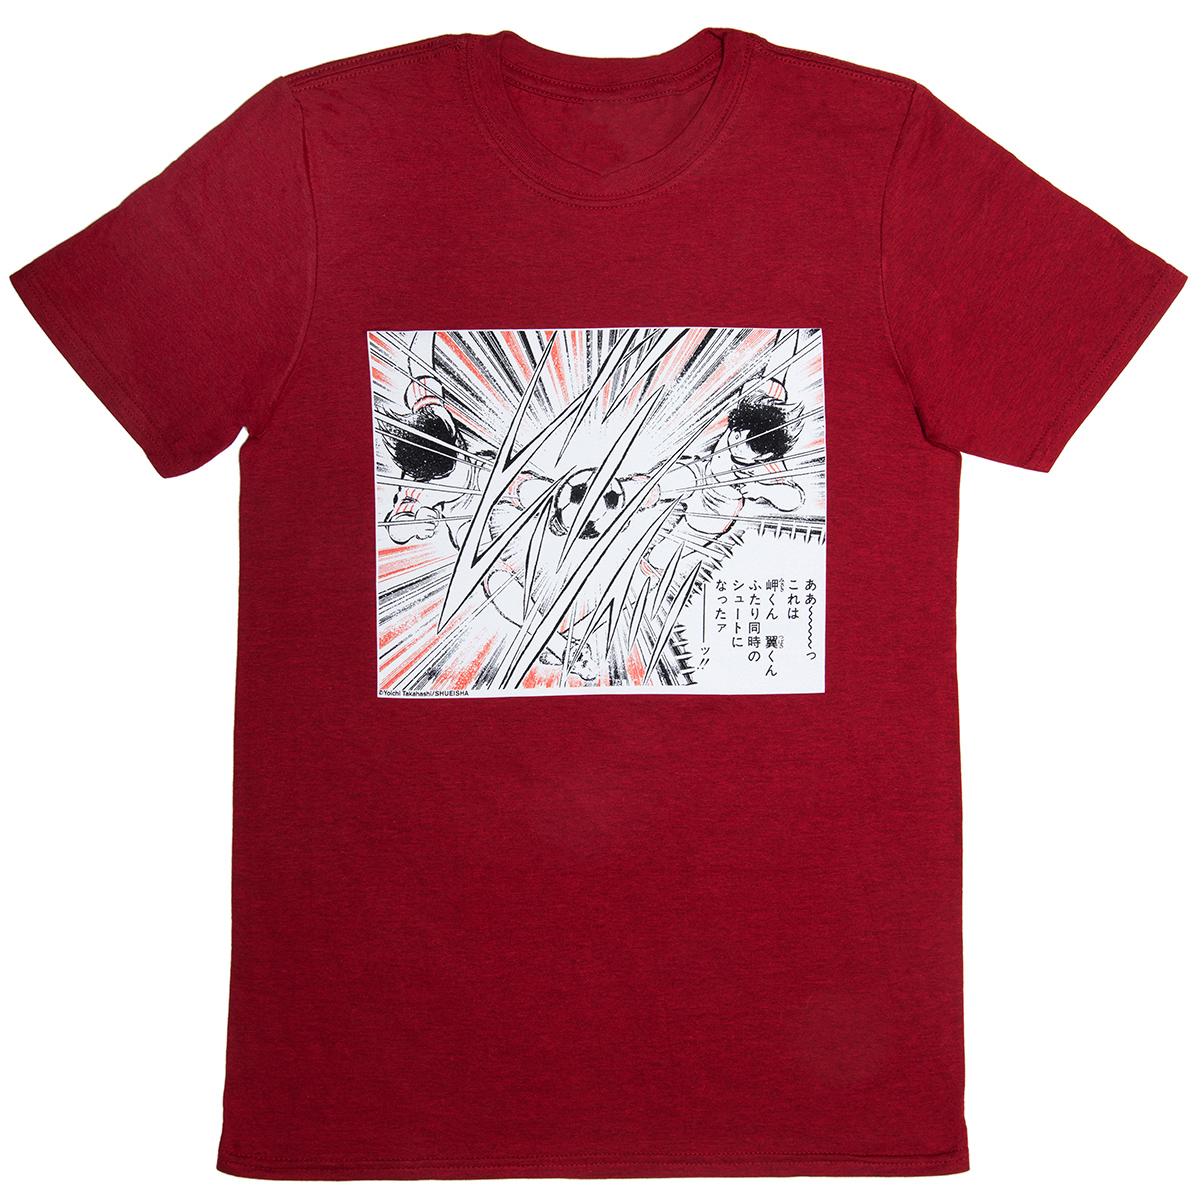 Captain Tsubasa t-shirt  (M)